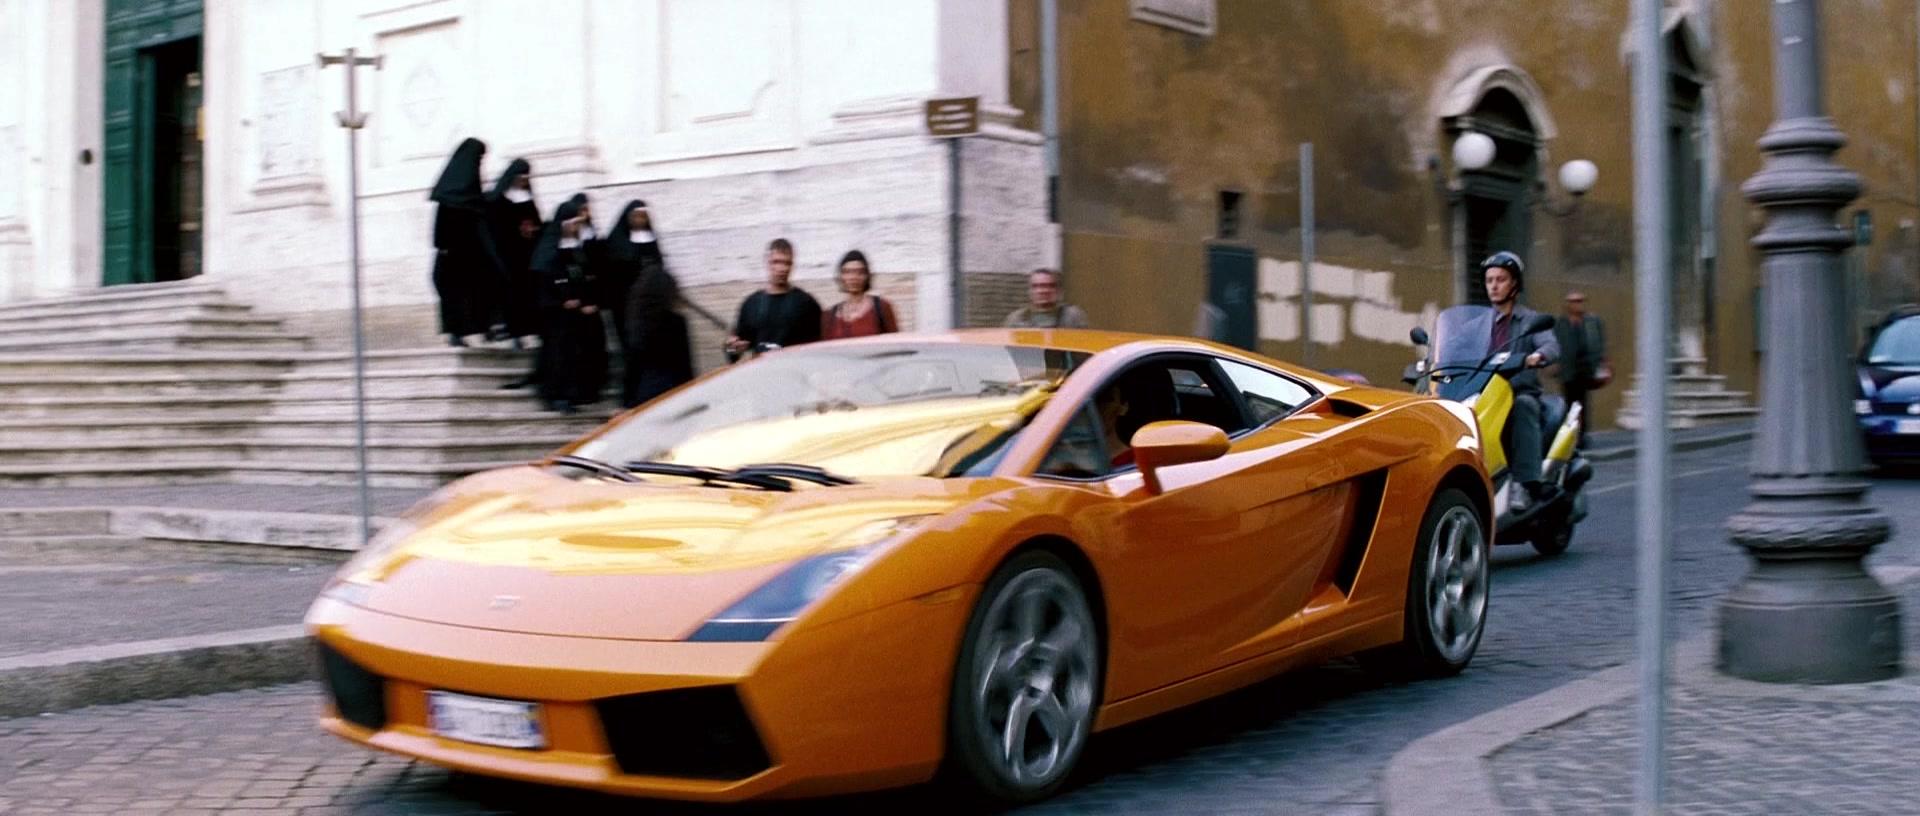 Used Cadillac Cts-V >> Lamborghini Gallardo Orange Sports Car Driven by Maggie Q ...